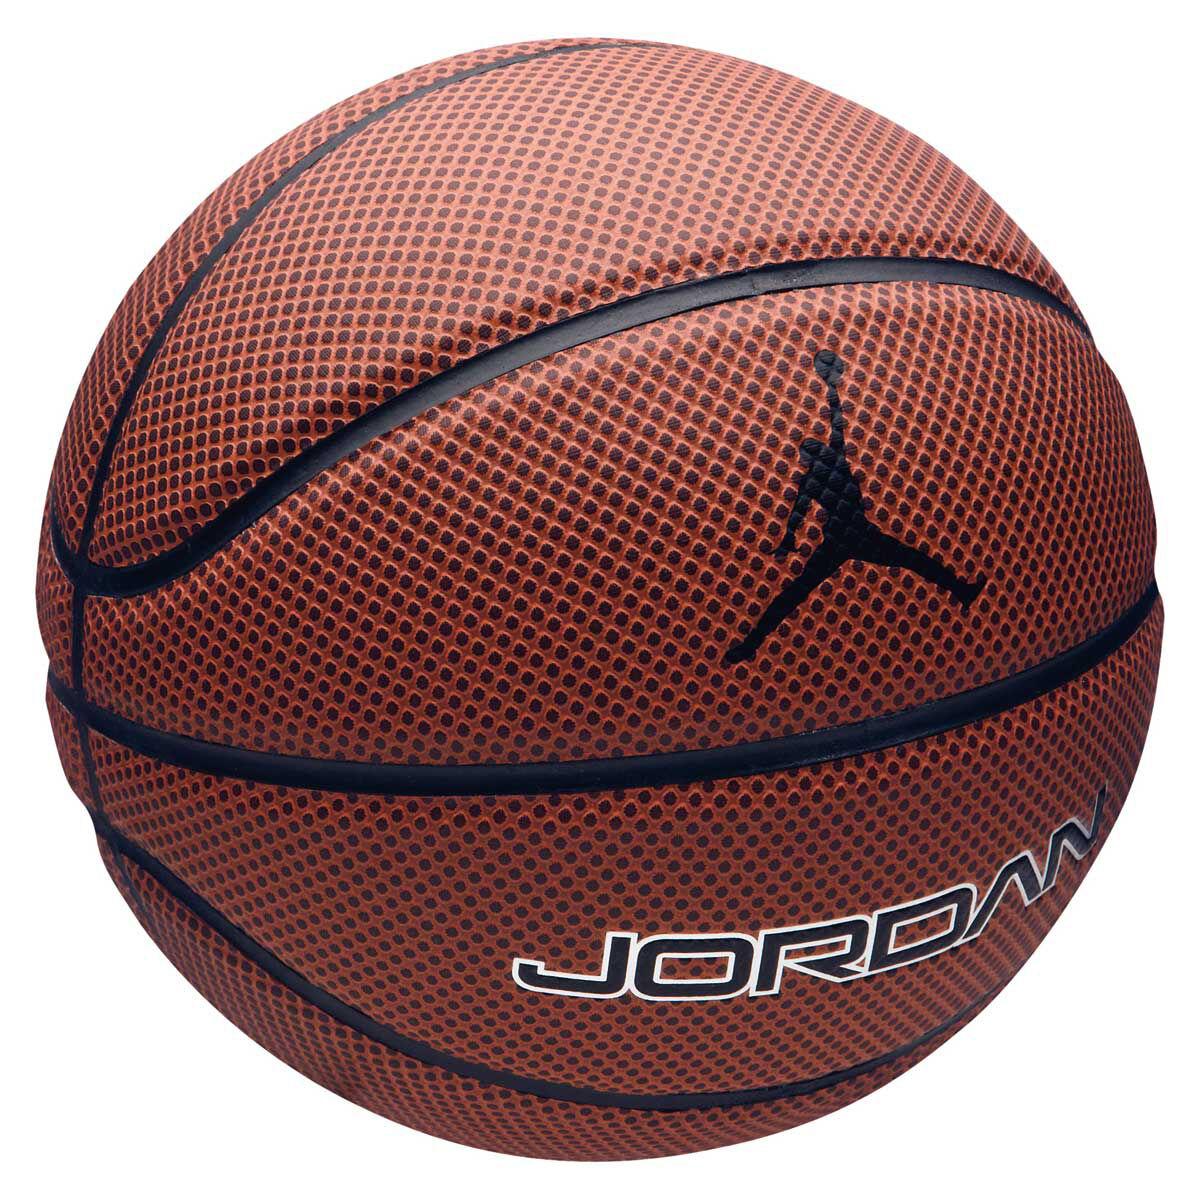 Nike Jordan Legacy Basketball 7 | Rebel